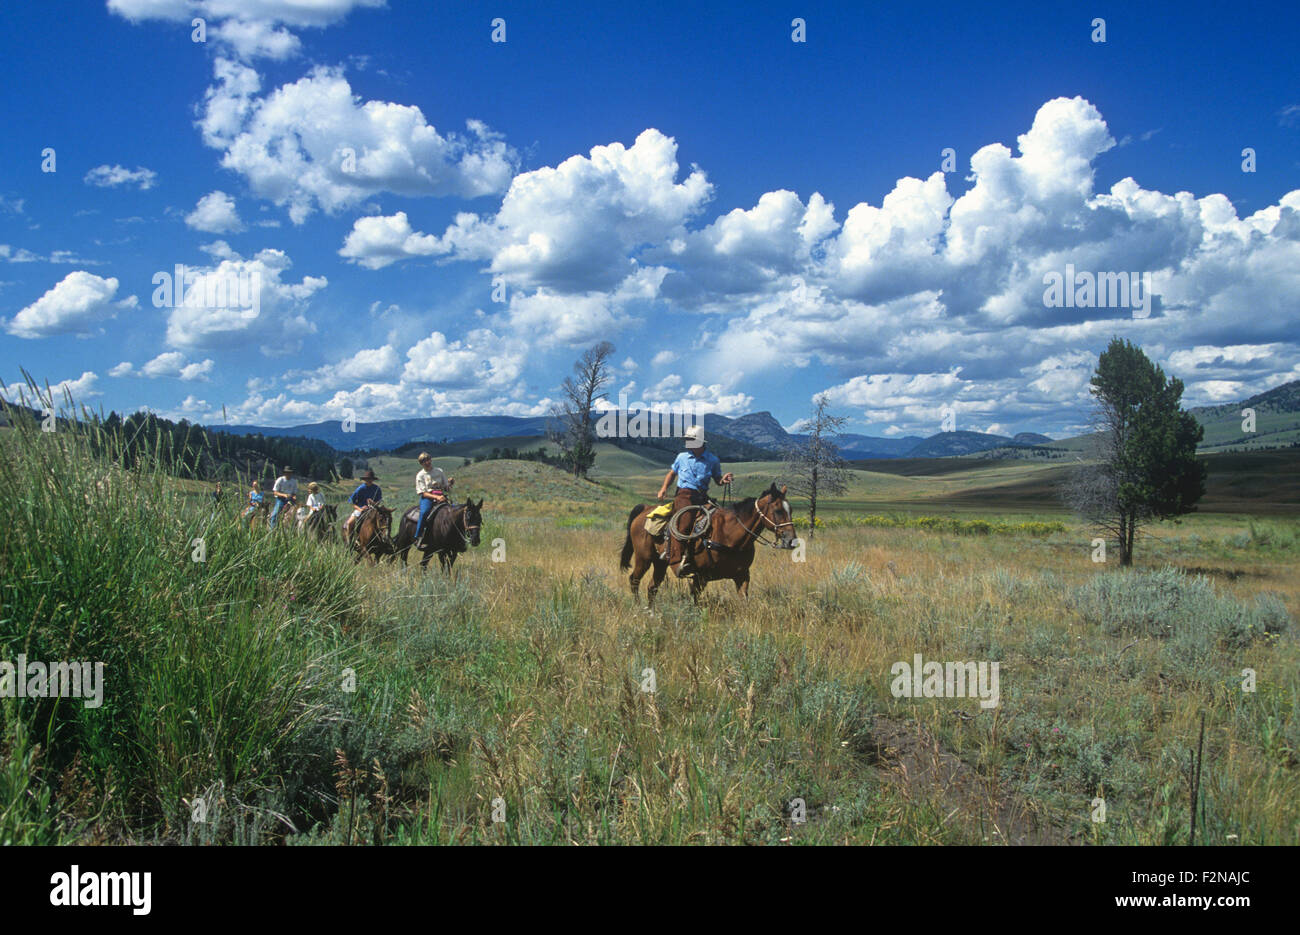 Horseback riders at Tower Junction, Yellowstone National Park, Wyoming, USA. Stock Photo